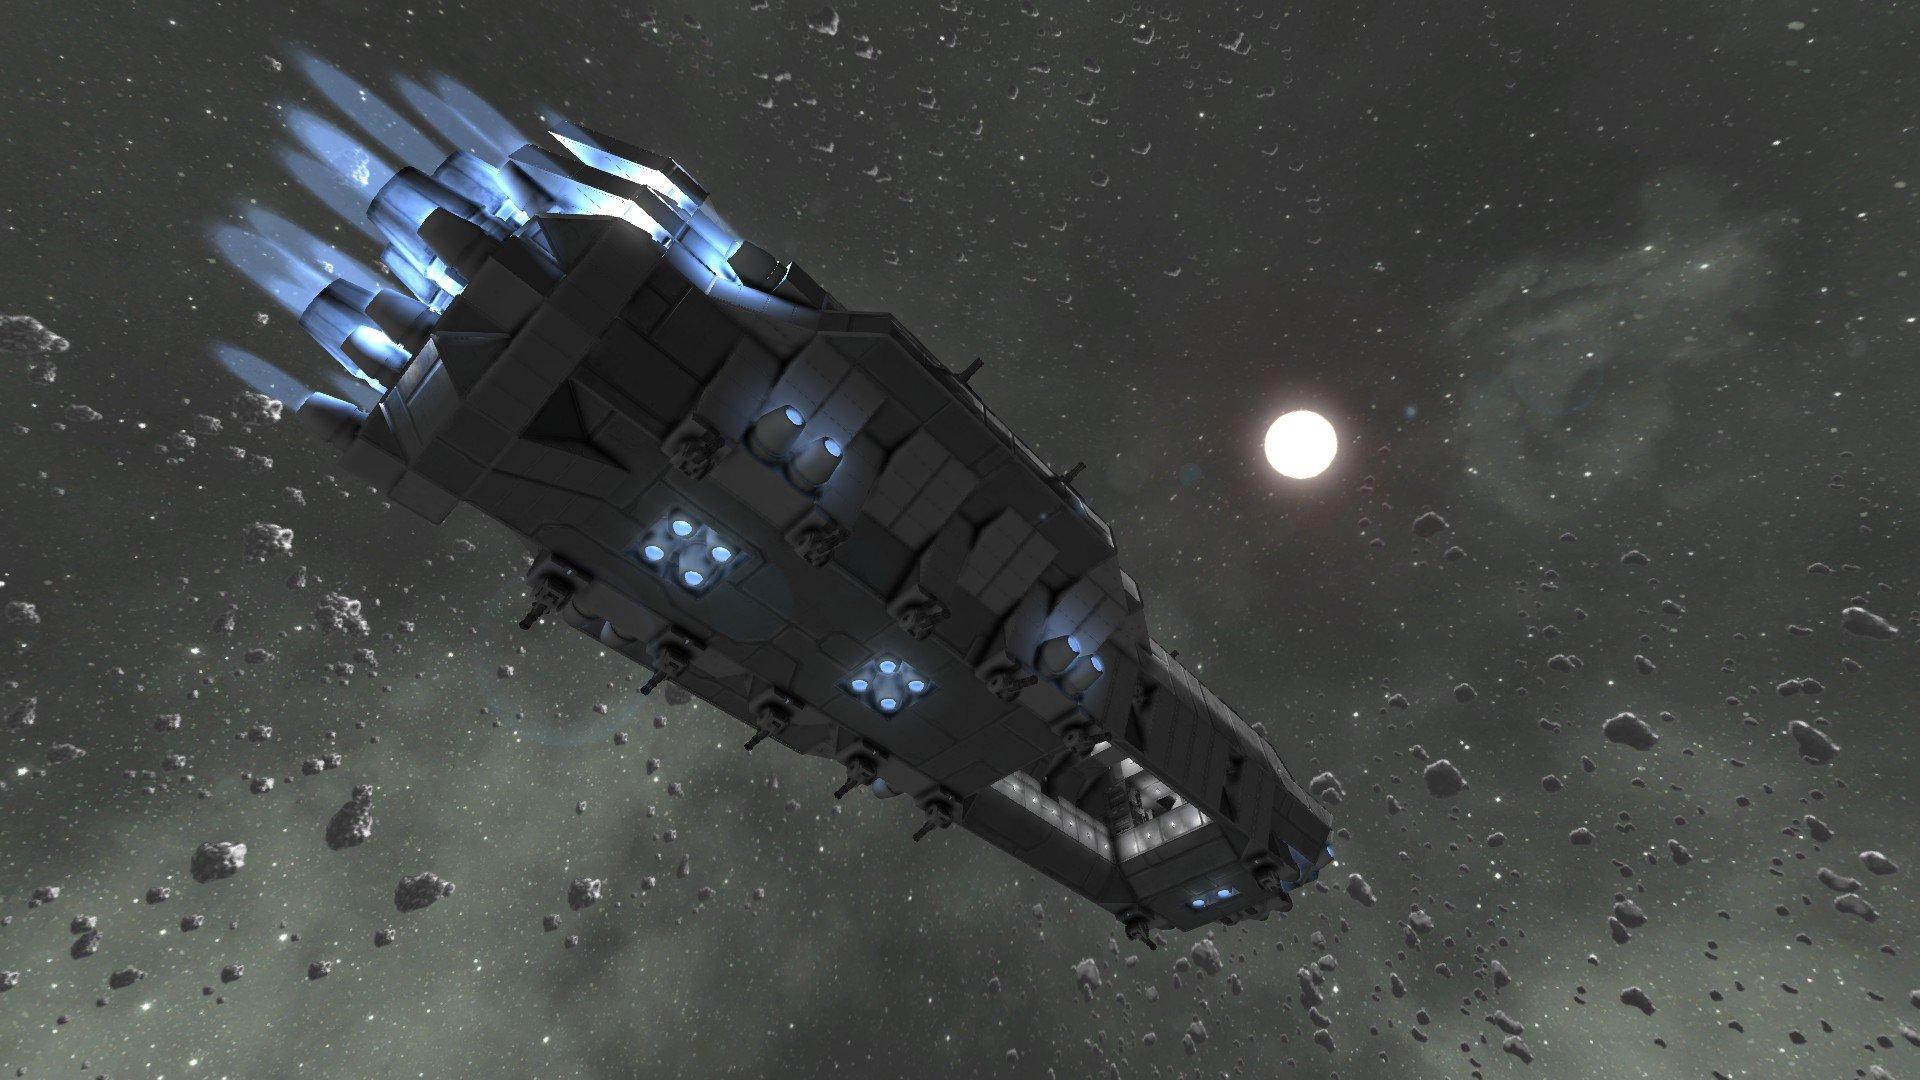 science fiction space sandbox - HD1920×1080